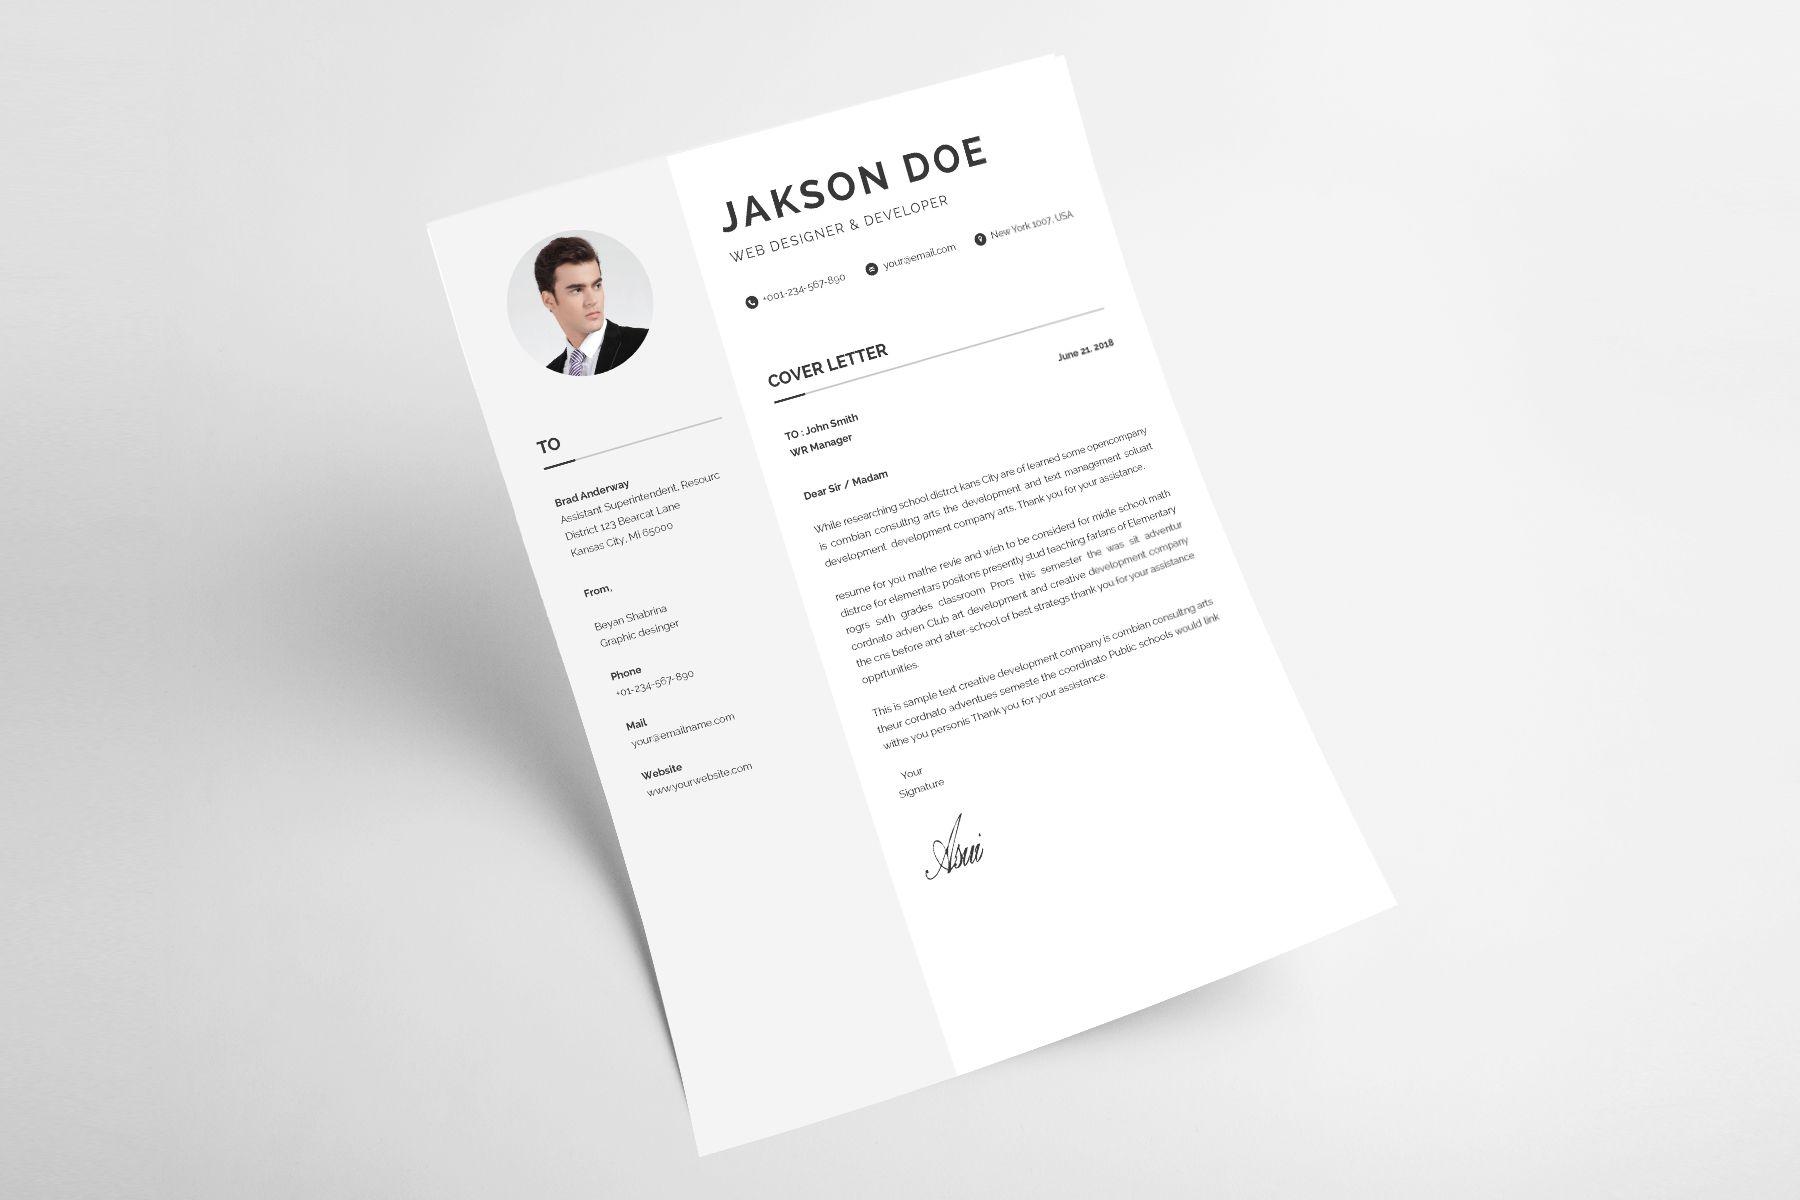 Jakson Doe Web Designer Developer Cv Resume Template 71811 Web Design Cv Resume Template Resume Template